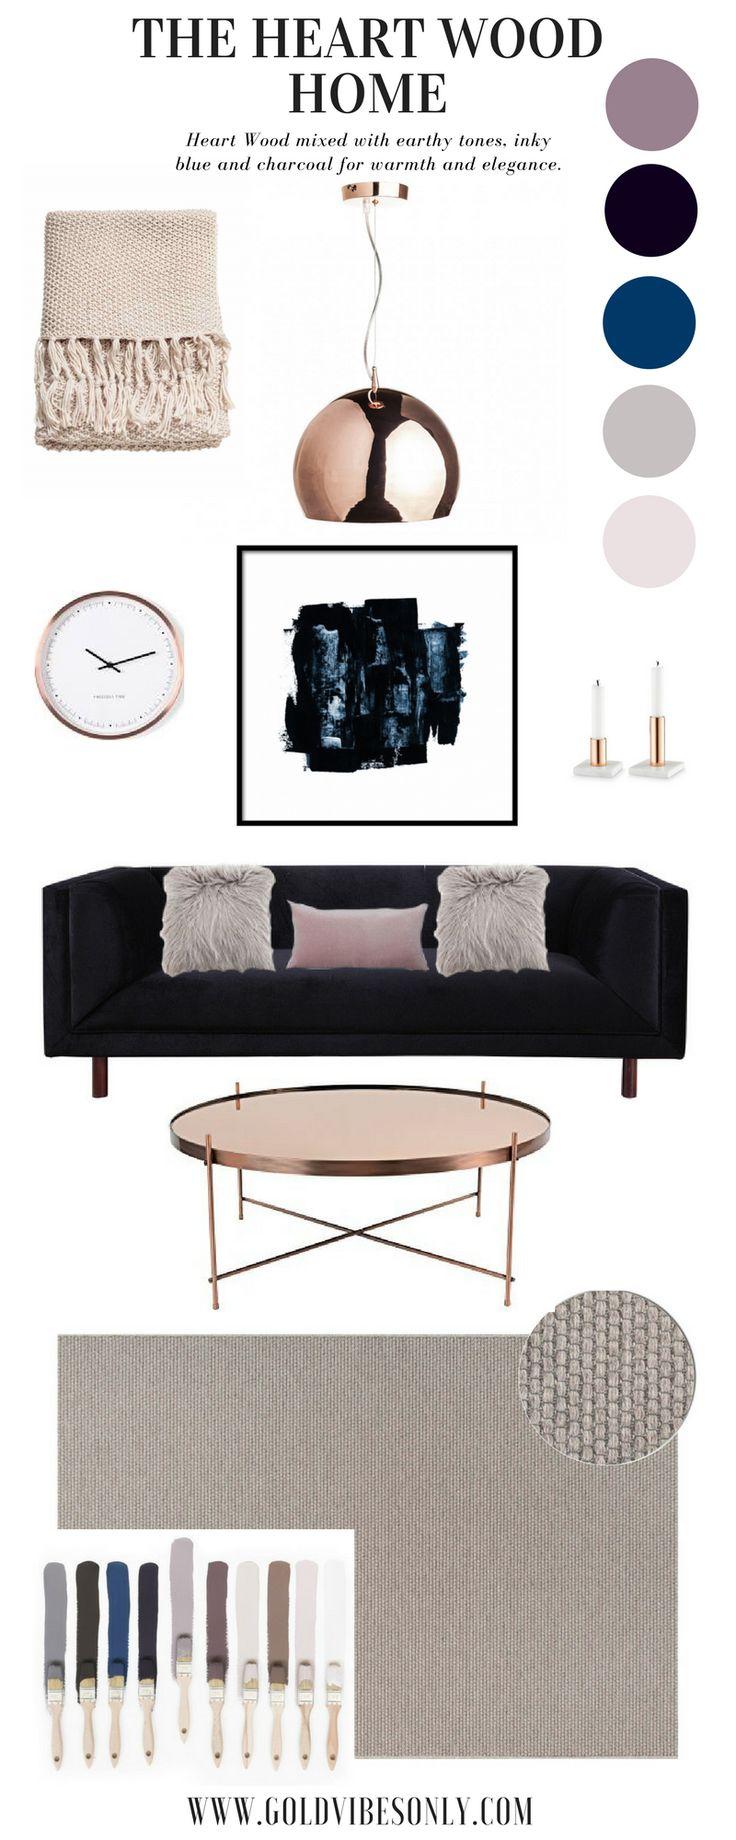 Best 25 dulux color ideas on pinterest living room for Living room 2700k or 3000k